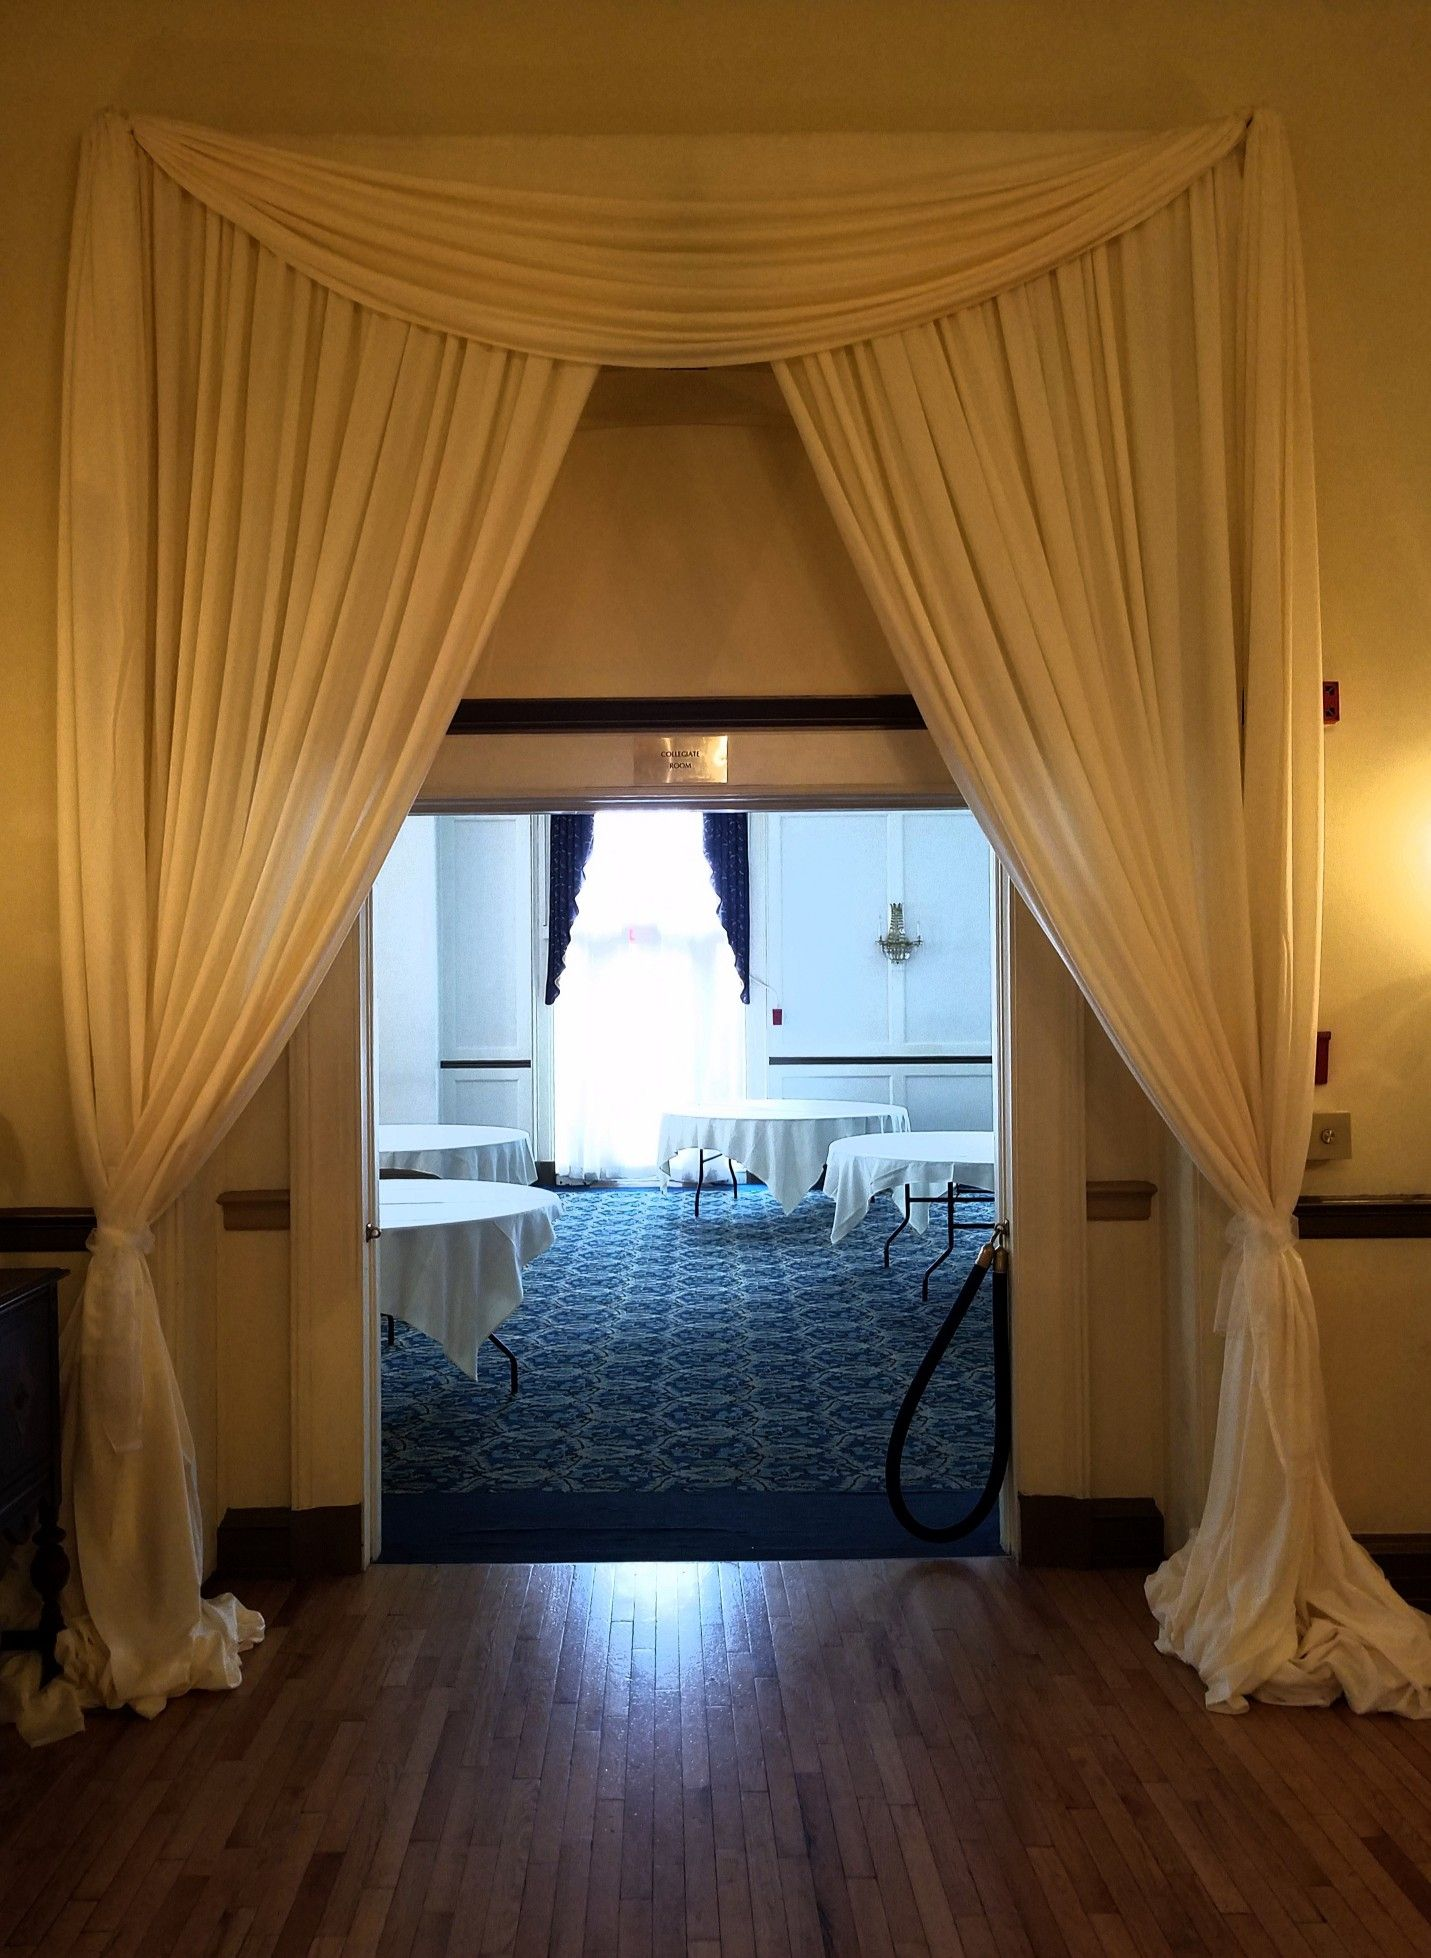 Grand entrance for a wedding home home decor decor